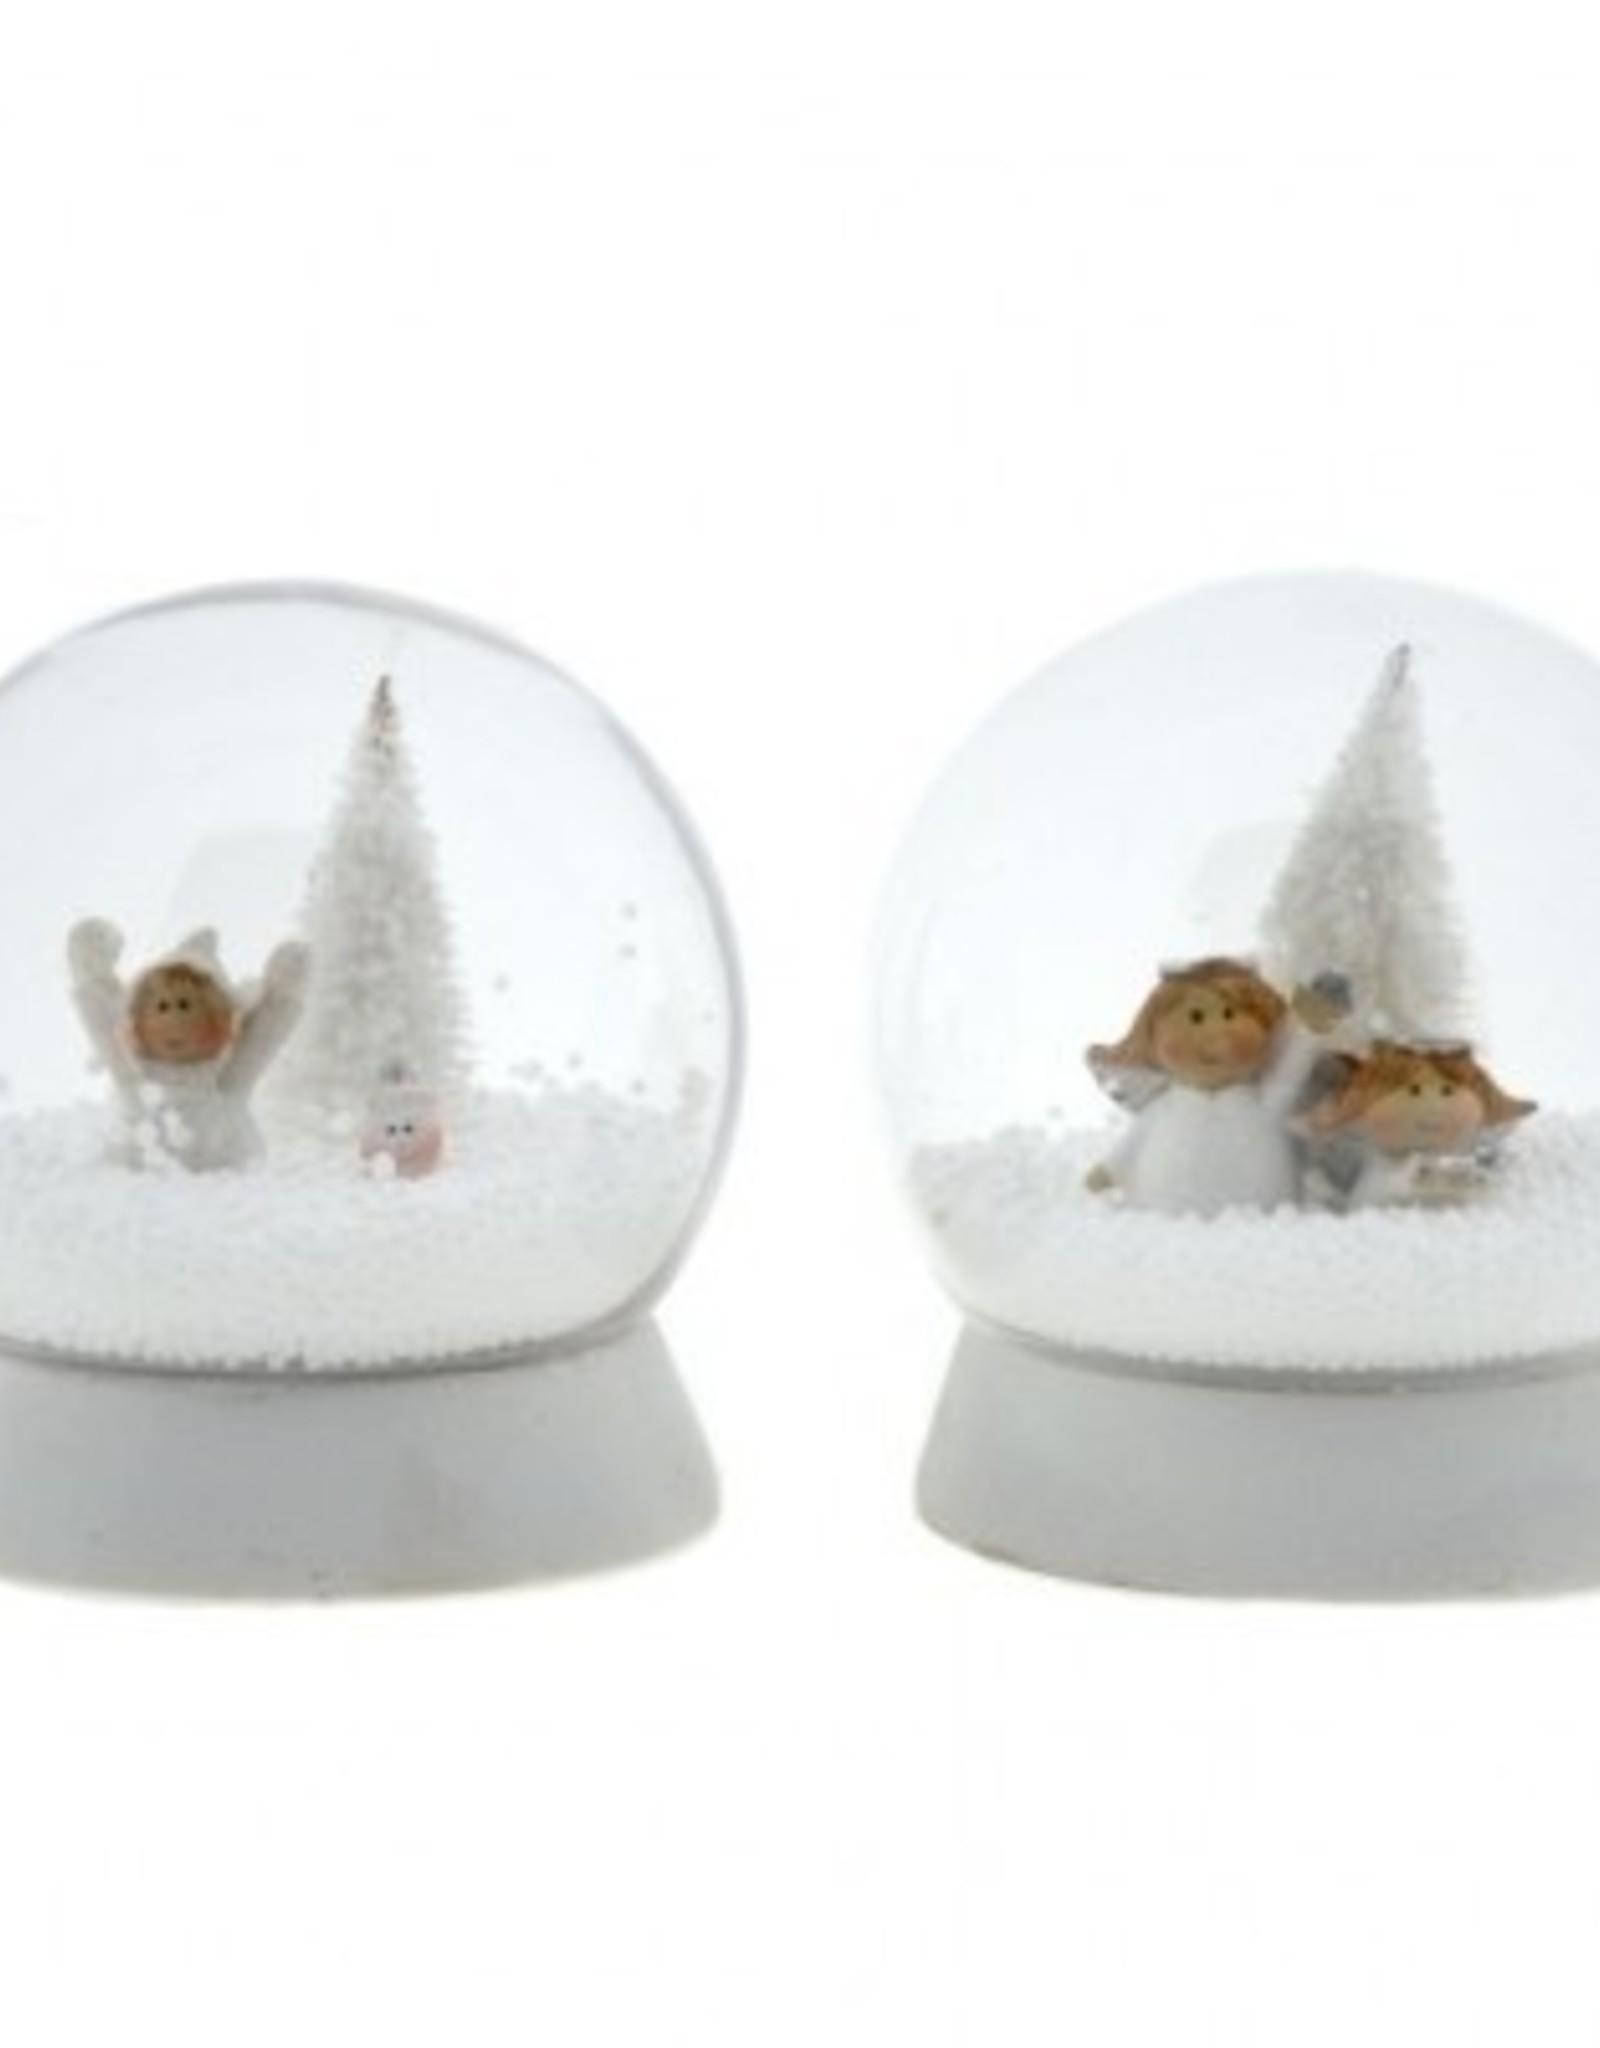 Sneeuwbol 10 cm assorti model